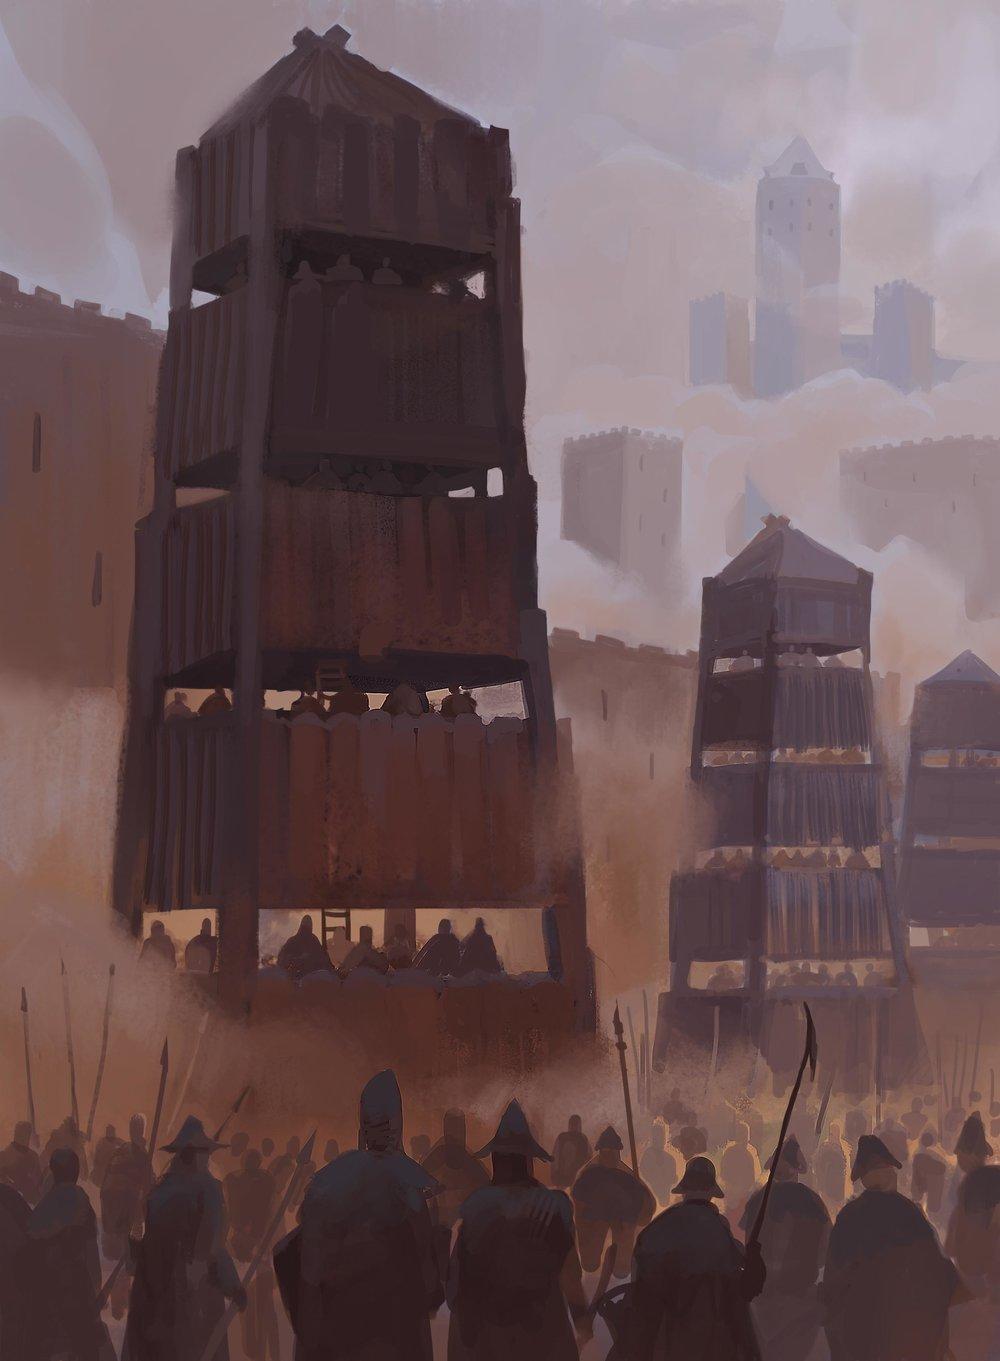 Belfry Tower_smaller.jpg